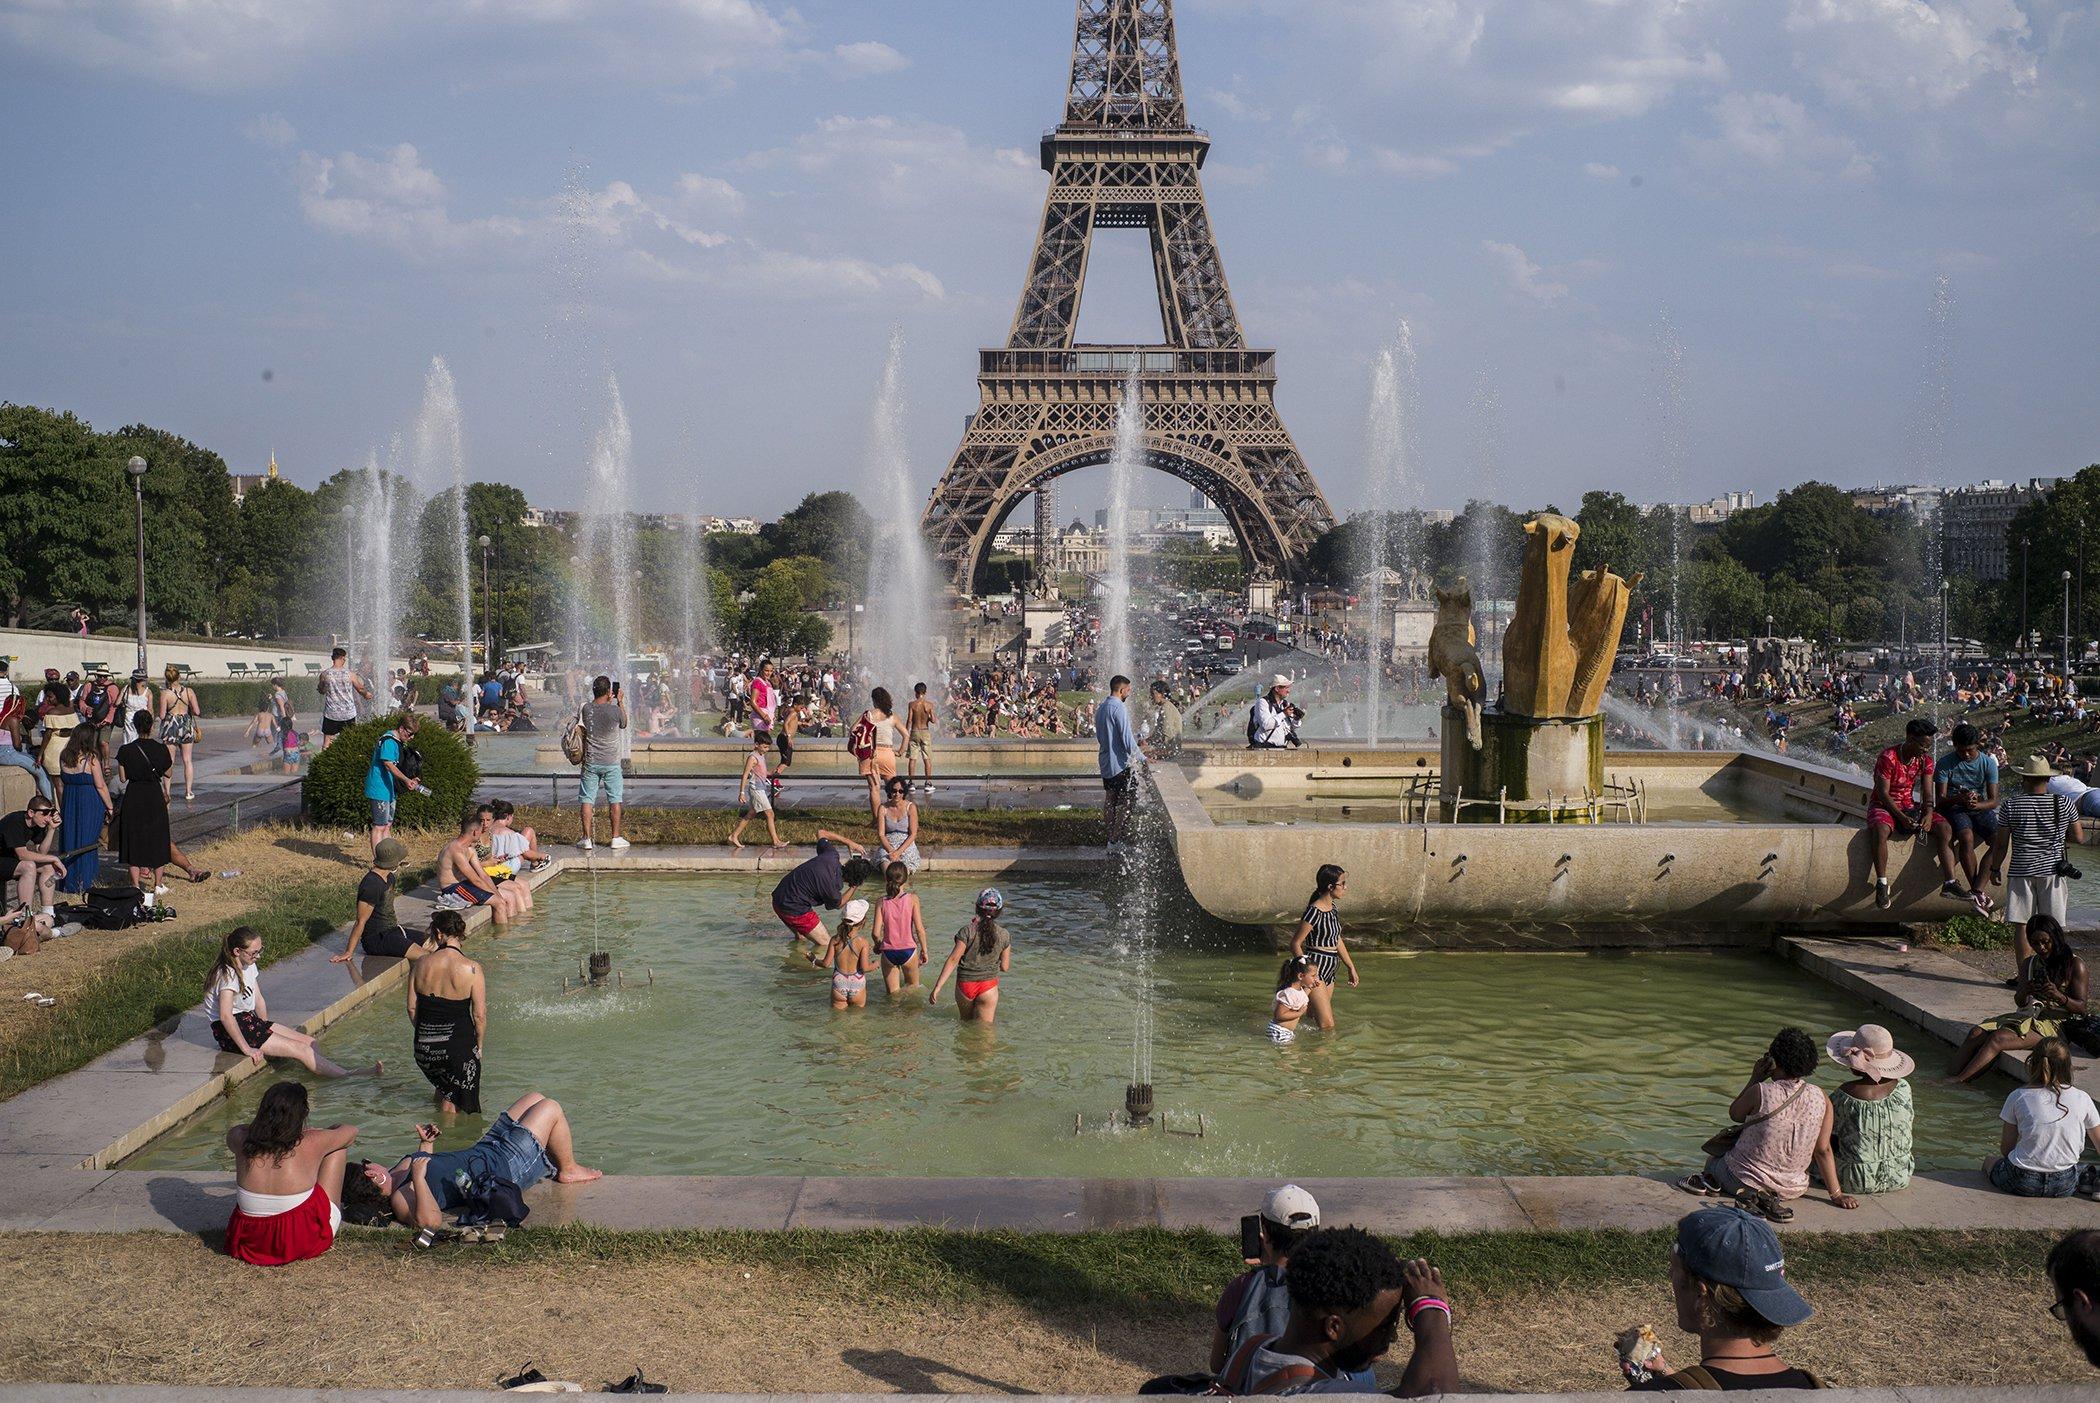 Record-Temperatures-Paris-Heat-Wave-July-2019.jpg